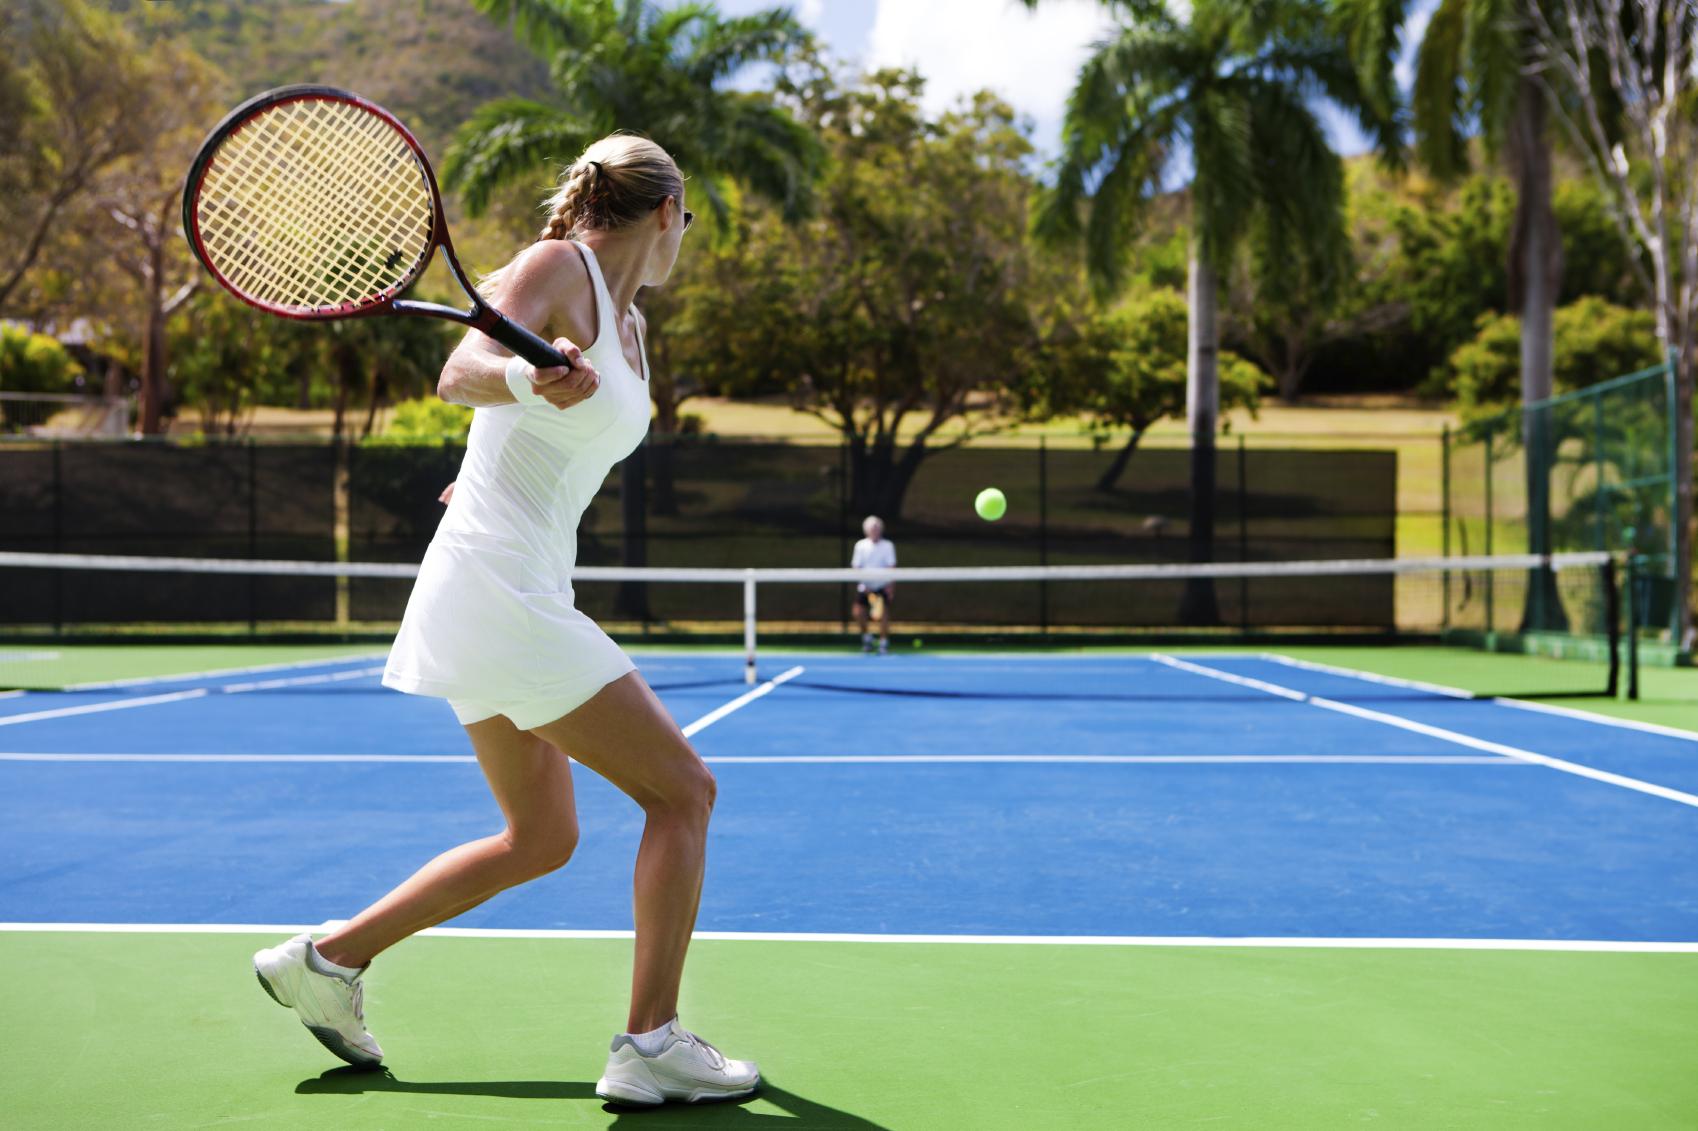 West Side Tennis Club Forest Hills